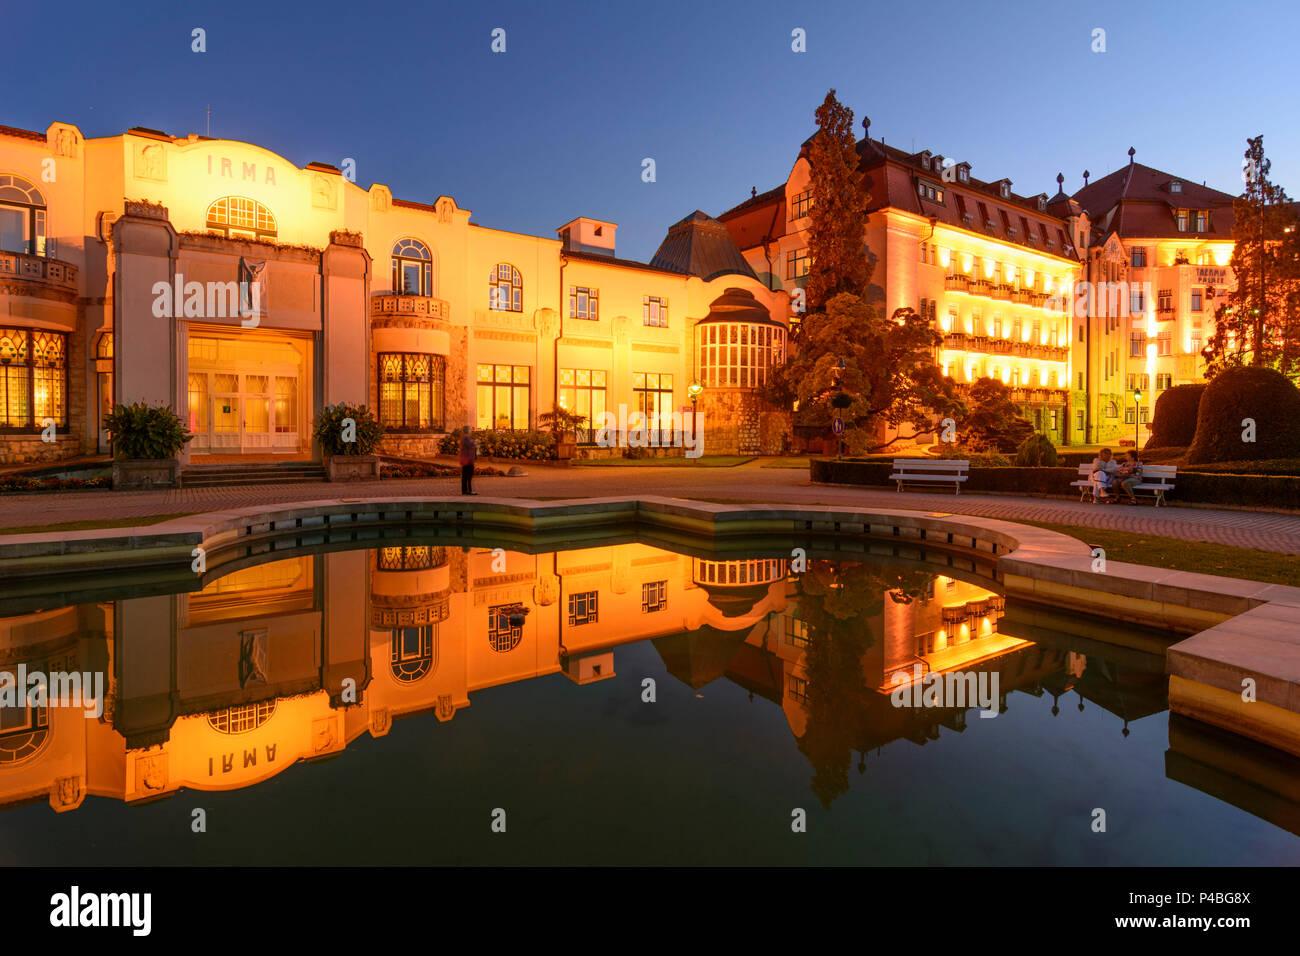 Piestany (pistyan), spa Irma, Hotel Thermia Palace, Slowakei Stockbild